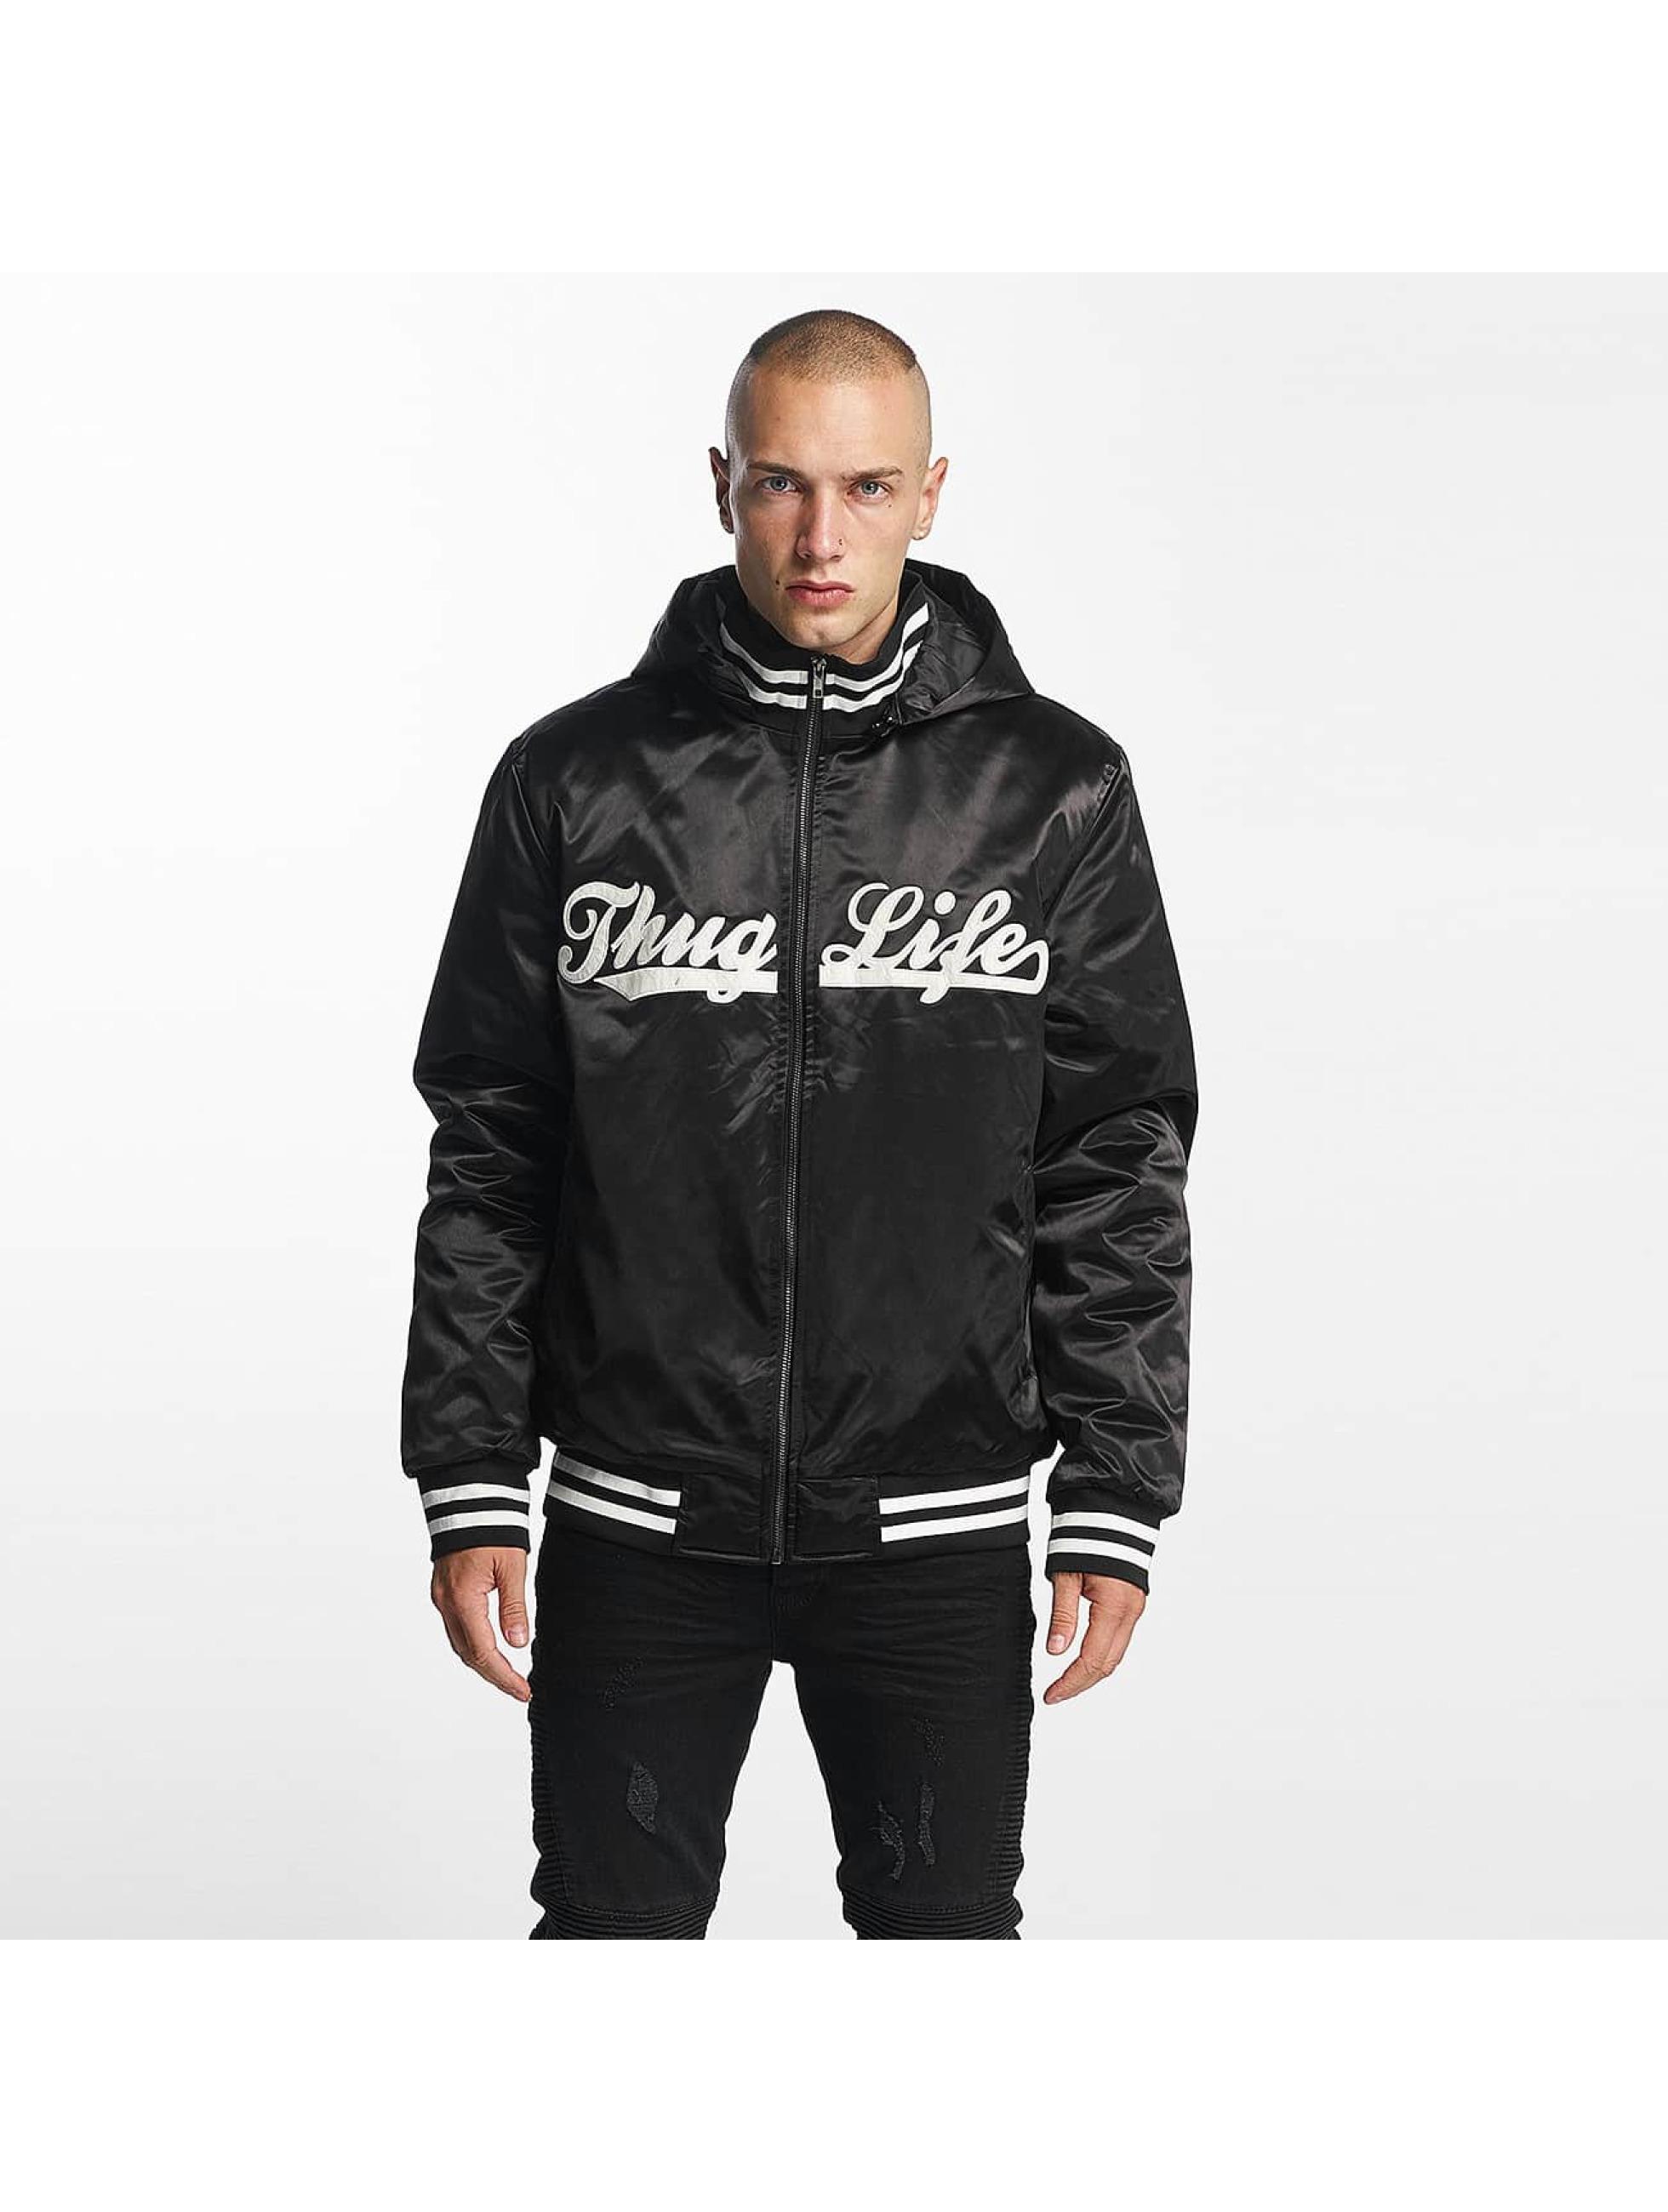 Thug Life / Bomber jacket New York in black XL